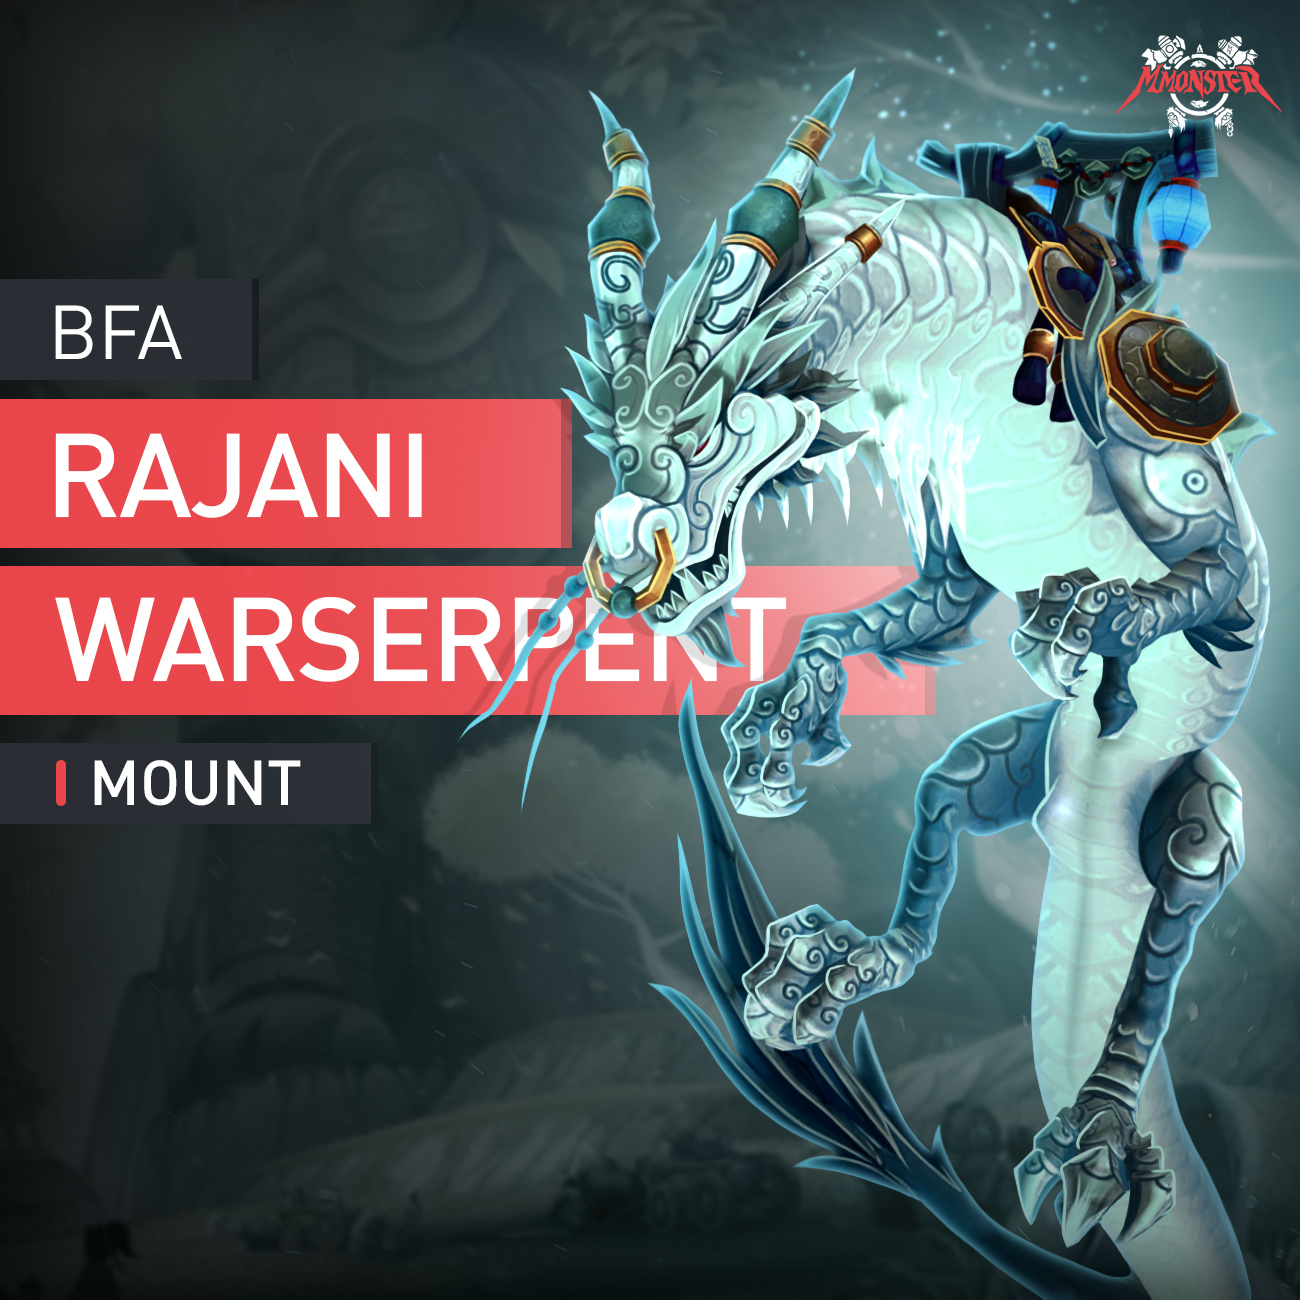 Rajani Warserpent Mount